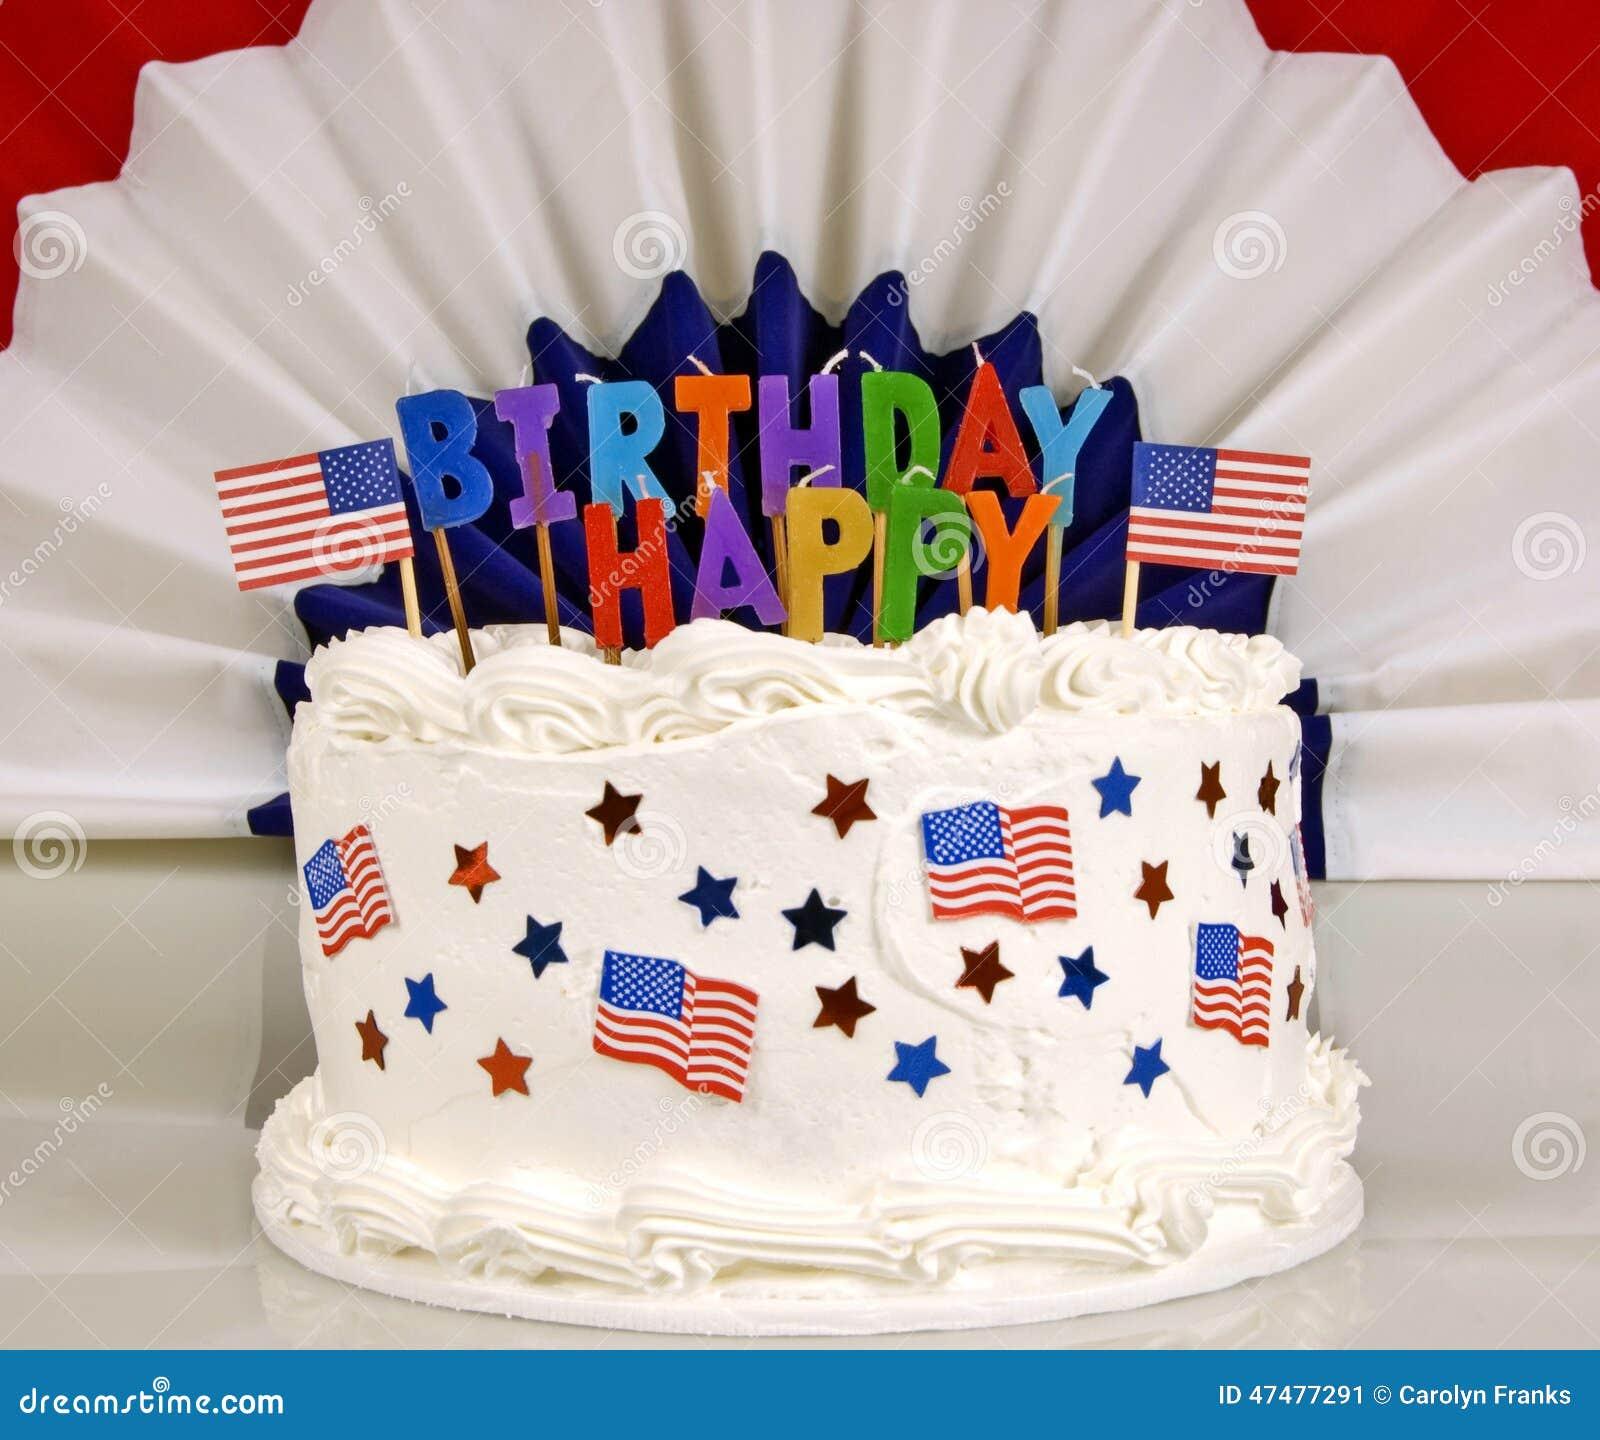 Blue Birthday Cake Wishes